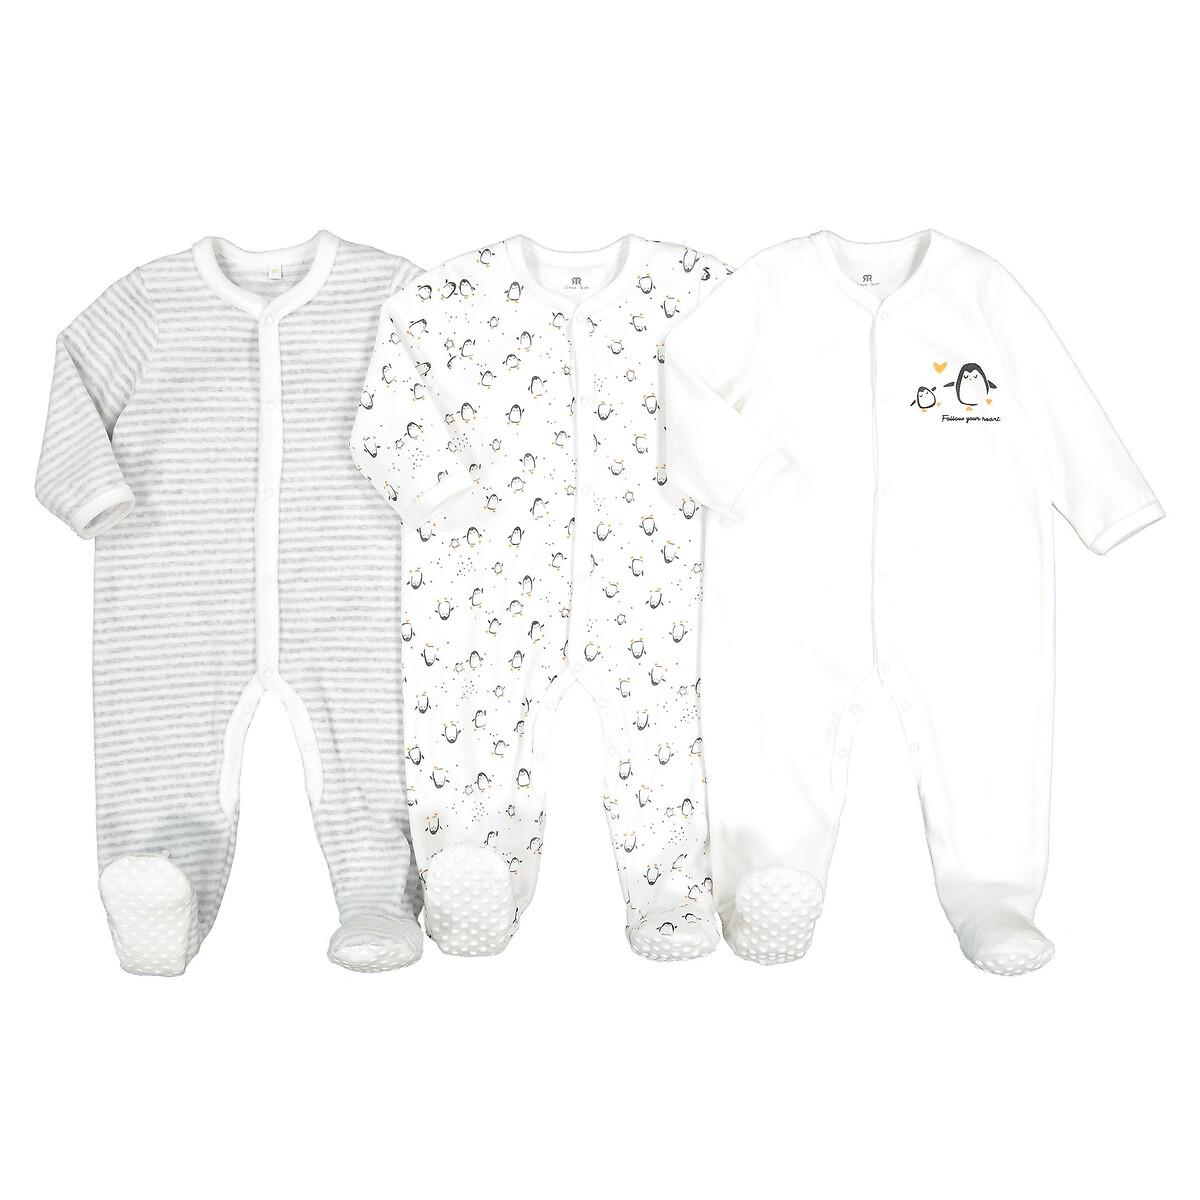 Комплект из 3 пижам из LaRedoute Велюра 0 мес - 2 года 1 мес. - 54 см белый пижама laredoute с носочками из велюра 0 мес 3 года 3 мес 60 см серый